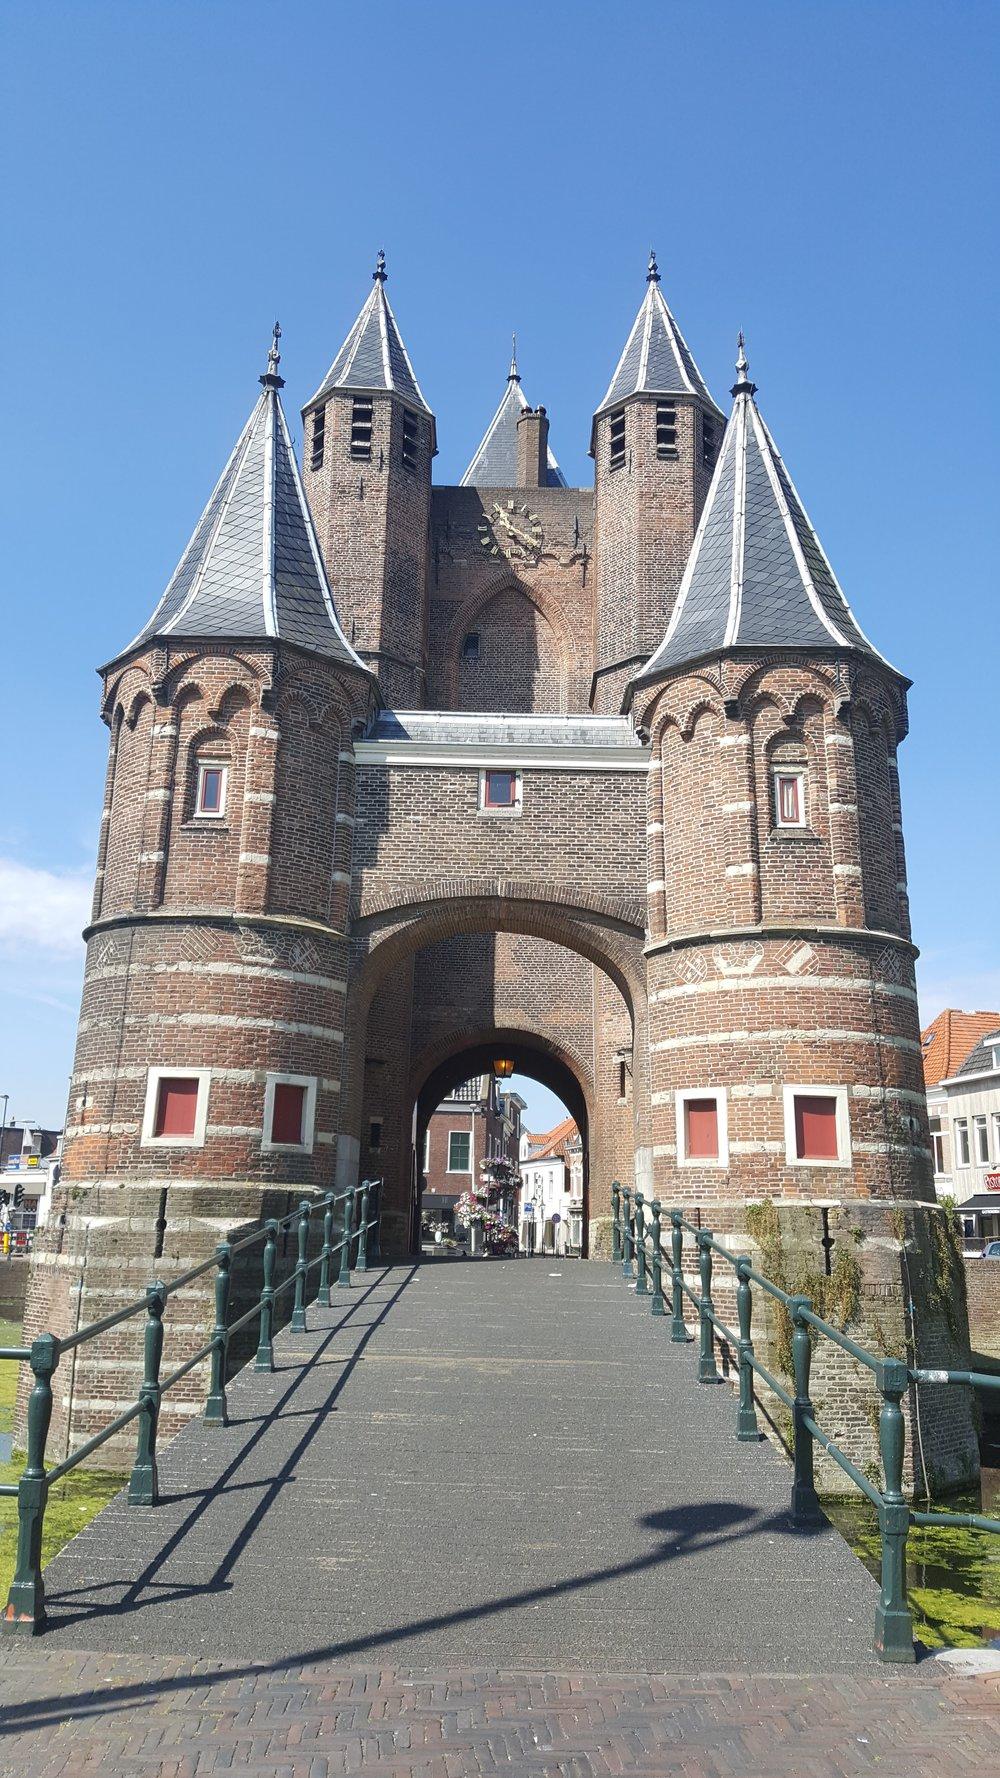 castle archway.jpg